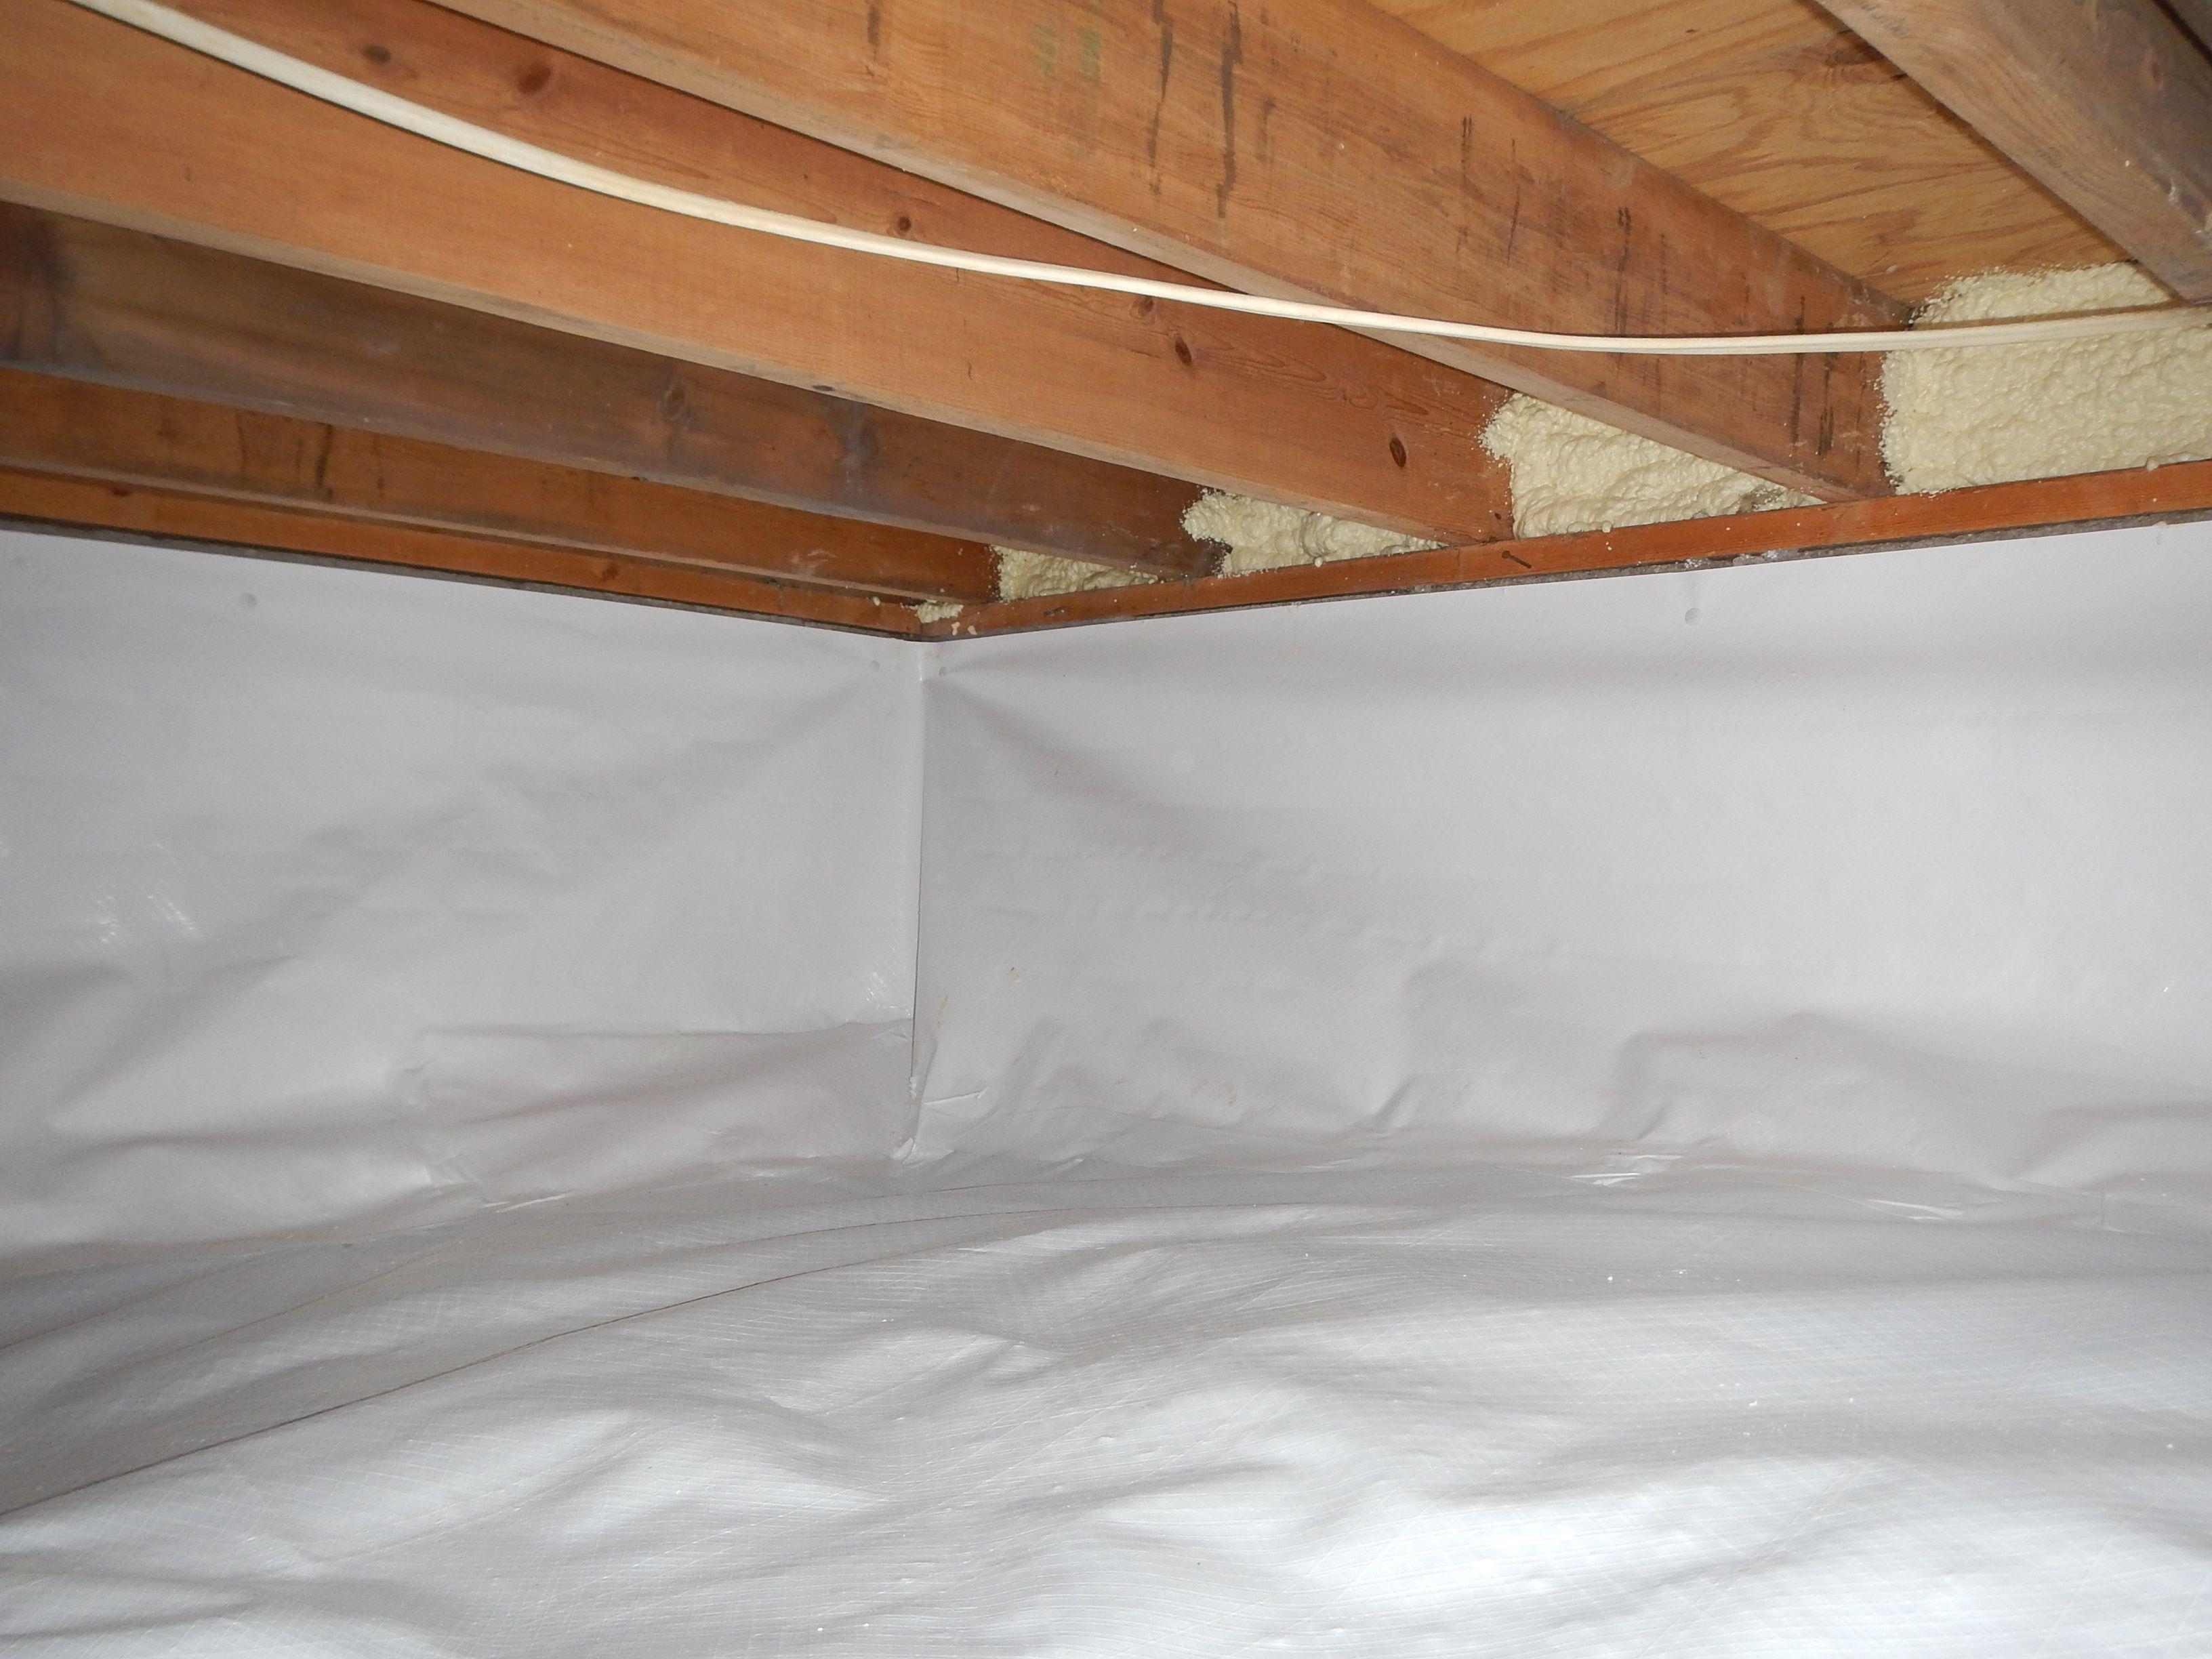 Crawlspace Encapsulation and Insulation. http//www